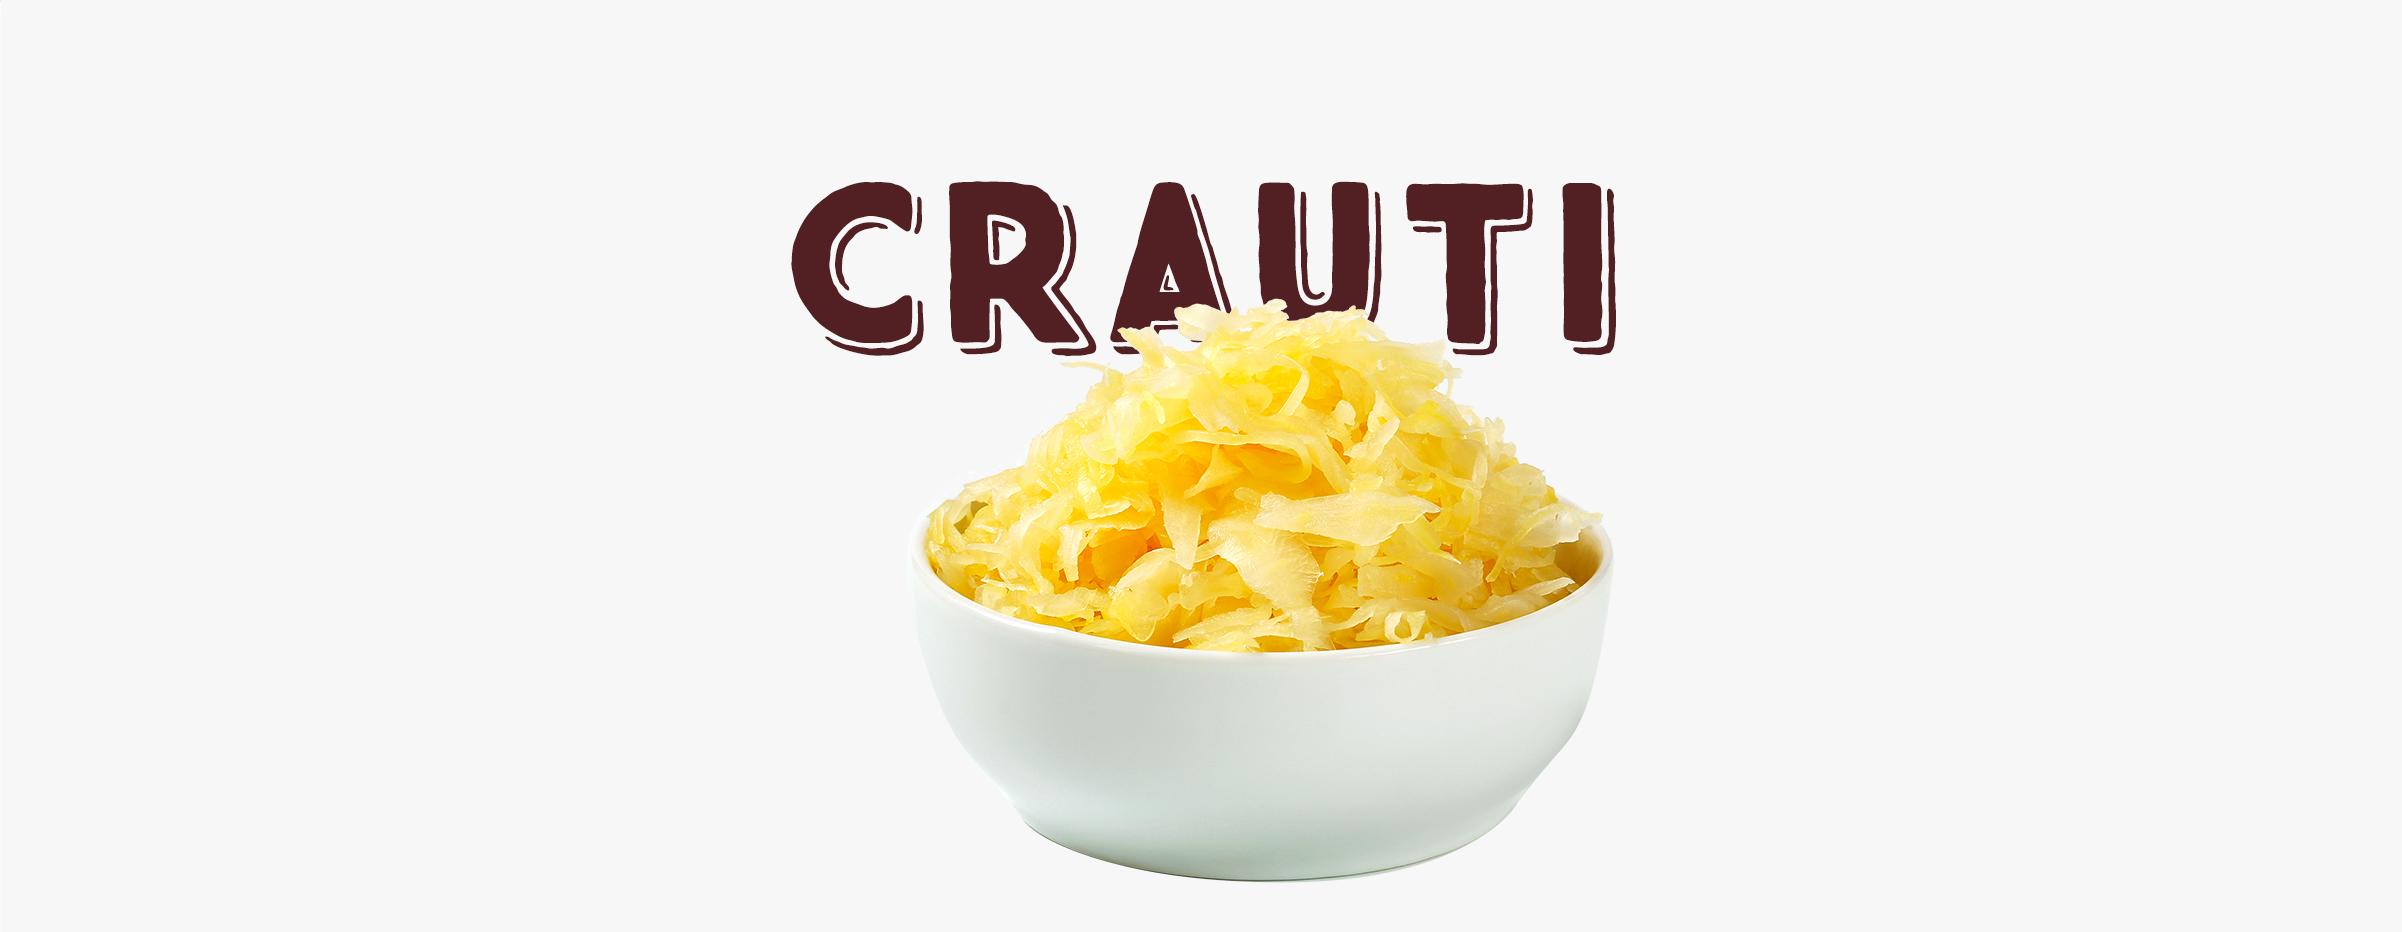 Crauti